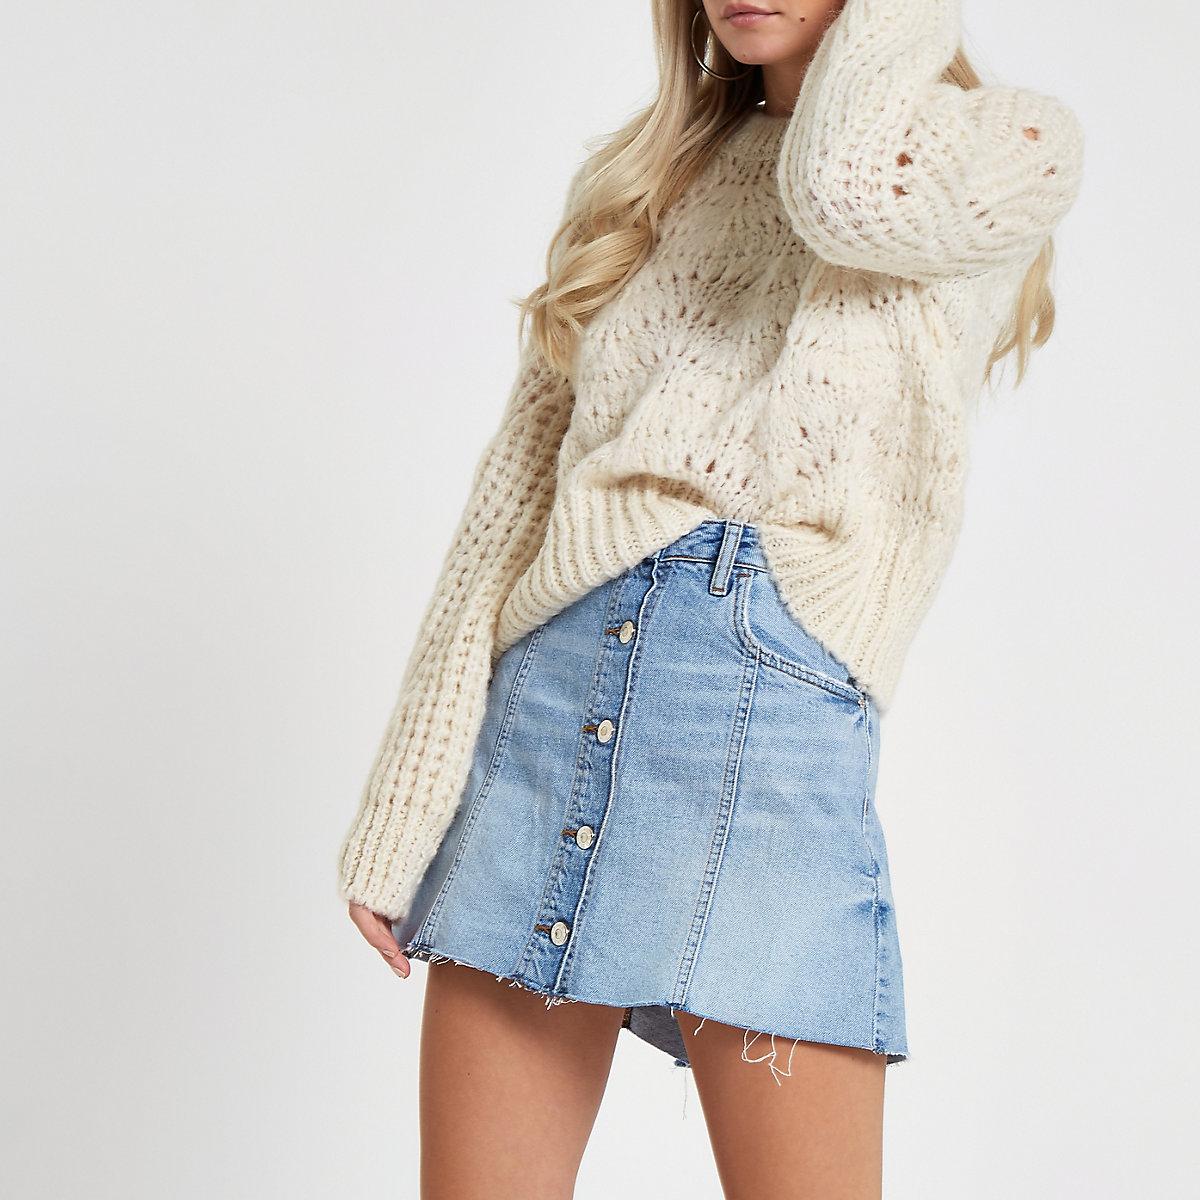 Petite cream knit sweater